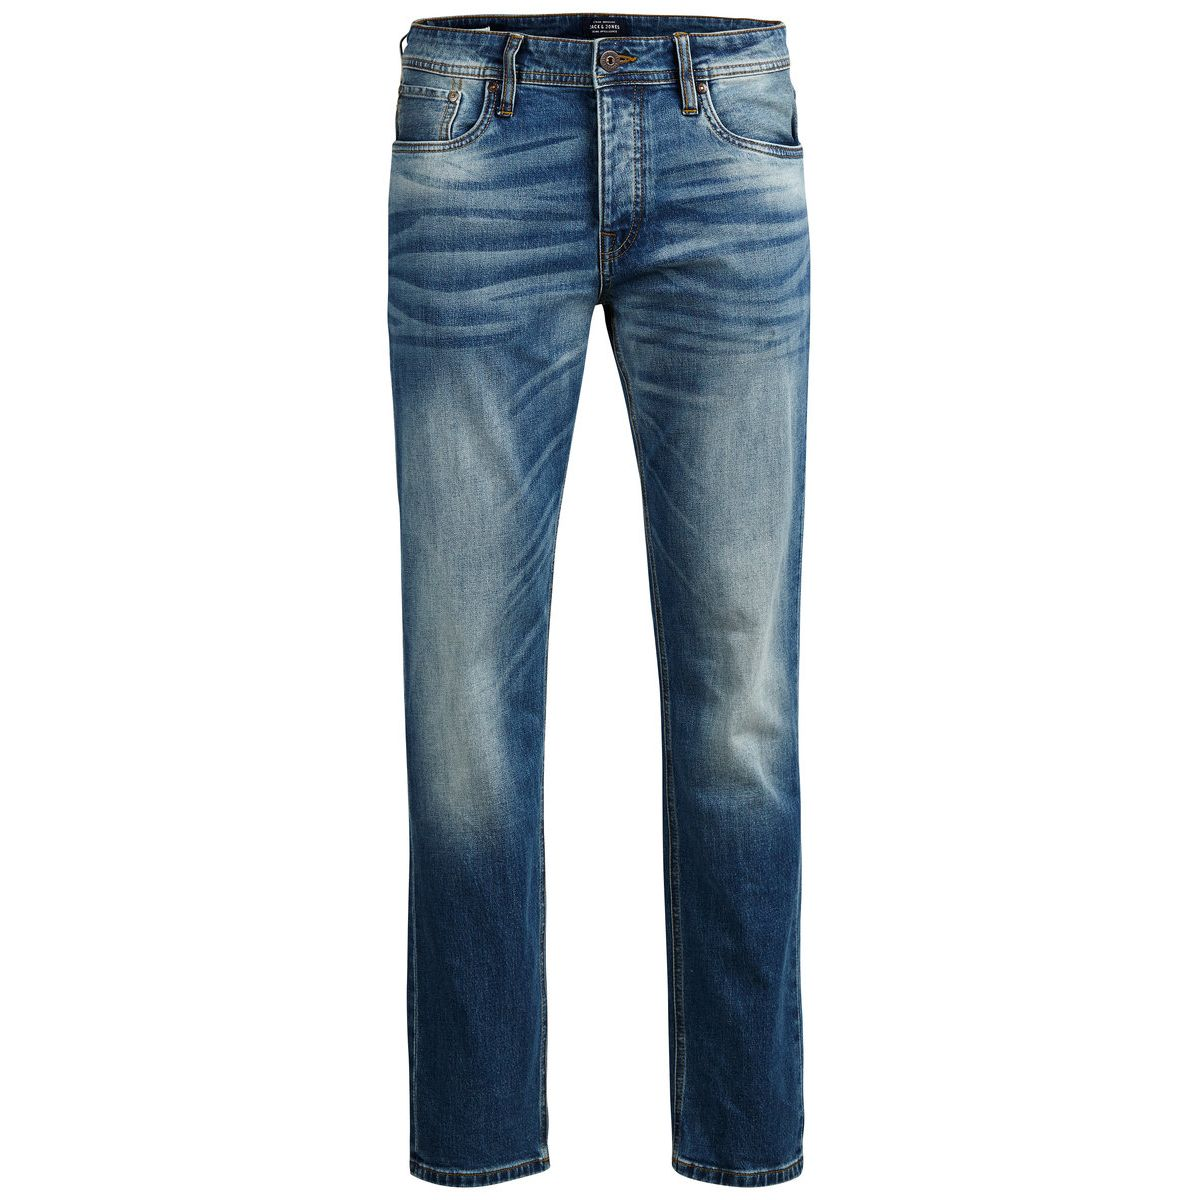 new product 3c6cd e32fa Jack   Jones Mike Original GE 616 Comfort Fit Jeans